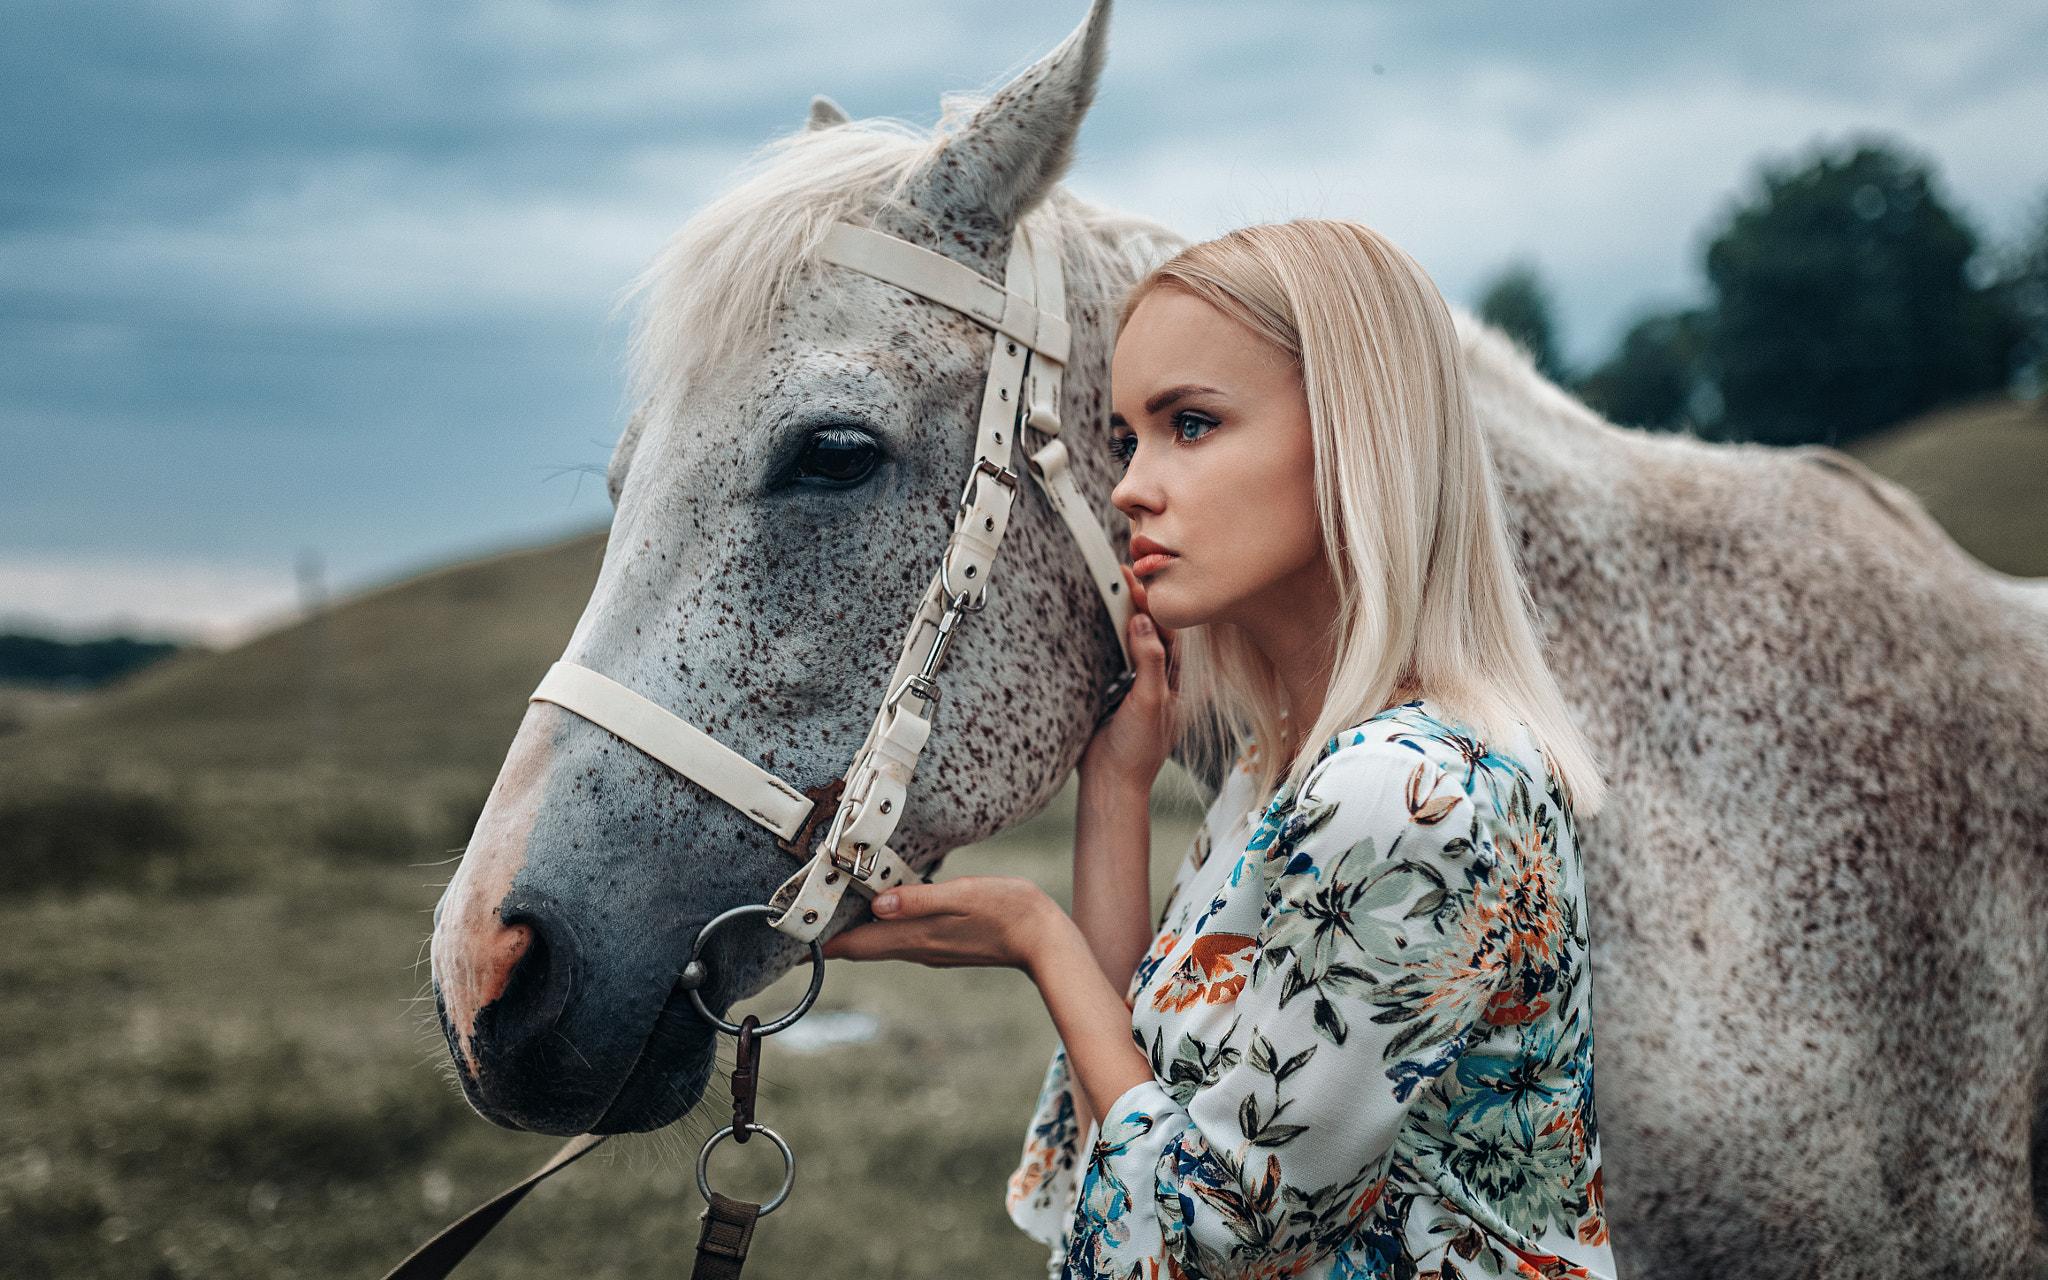 profile women with horse women blue eyes animals blonde women outdoors horse